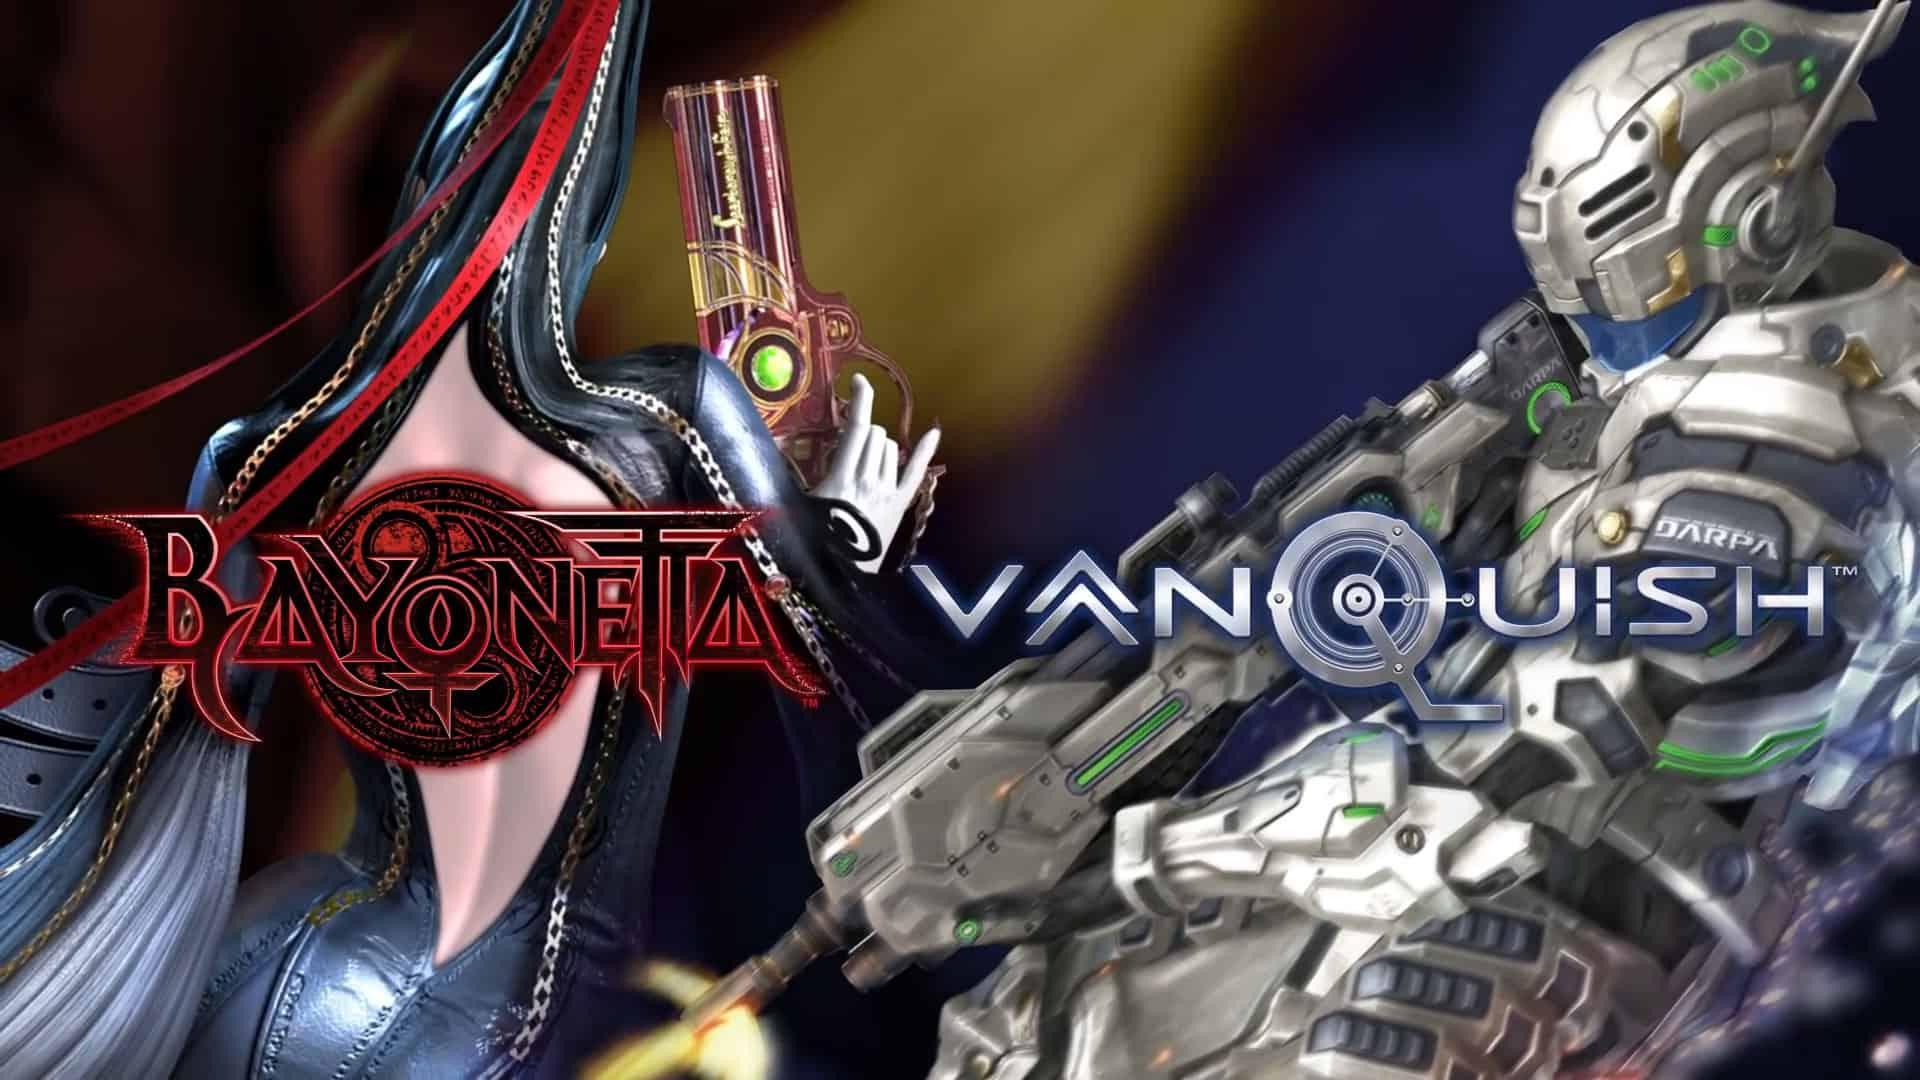 Bayonetta and Vanquish Dragon Ball Z: Kakarot 2020 Video game Releases